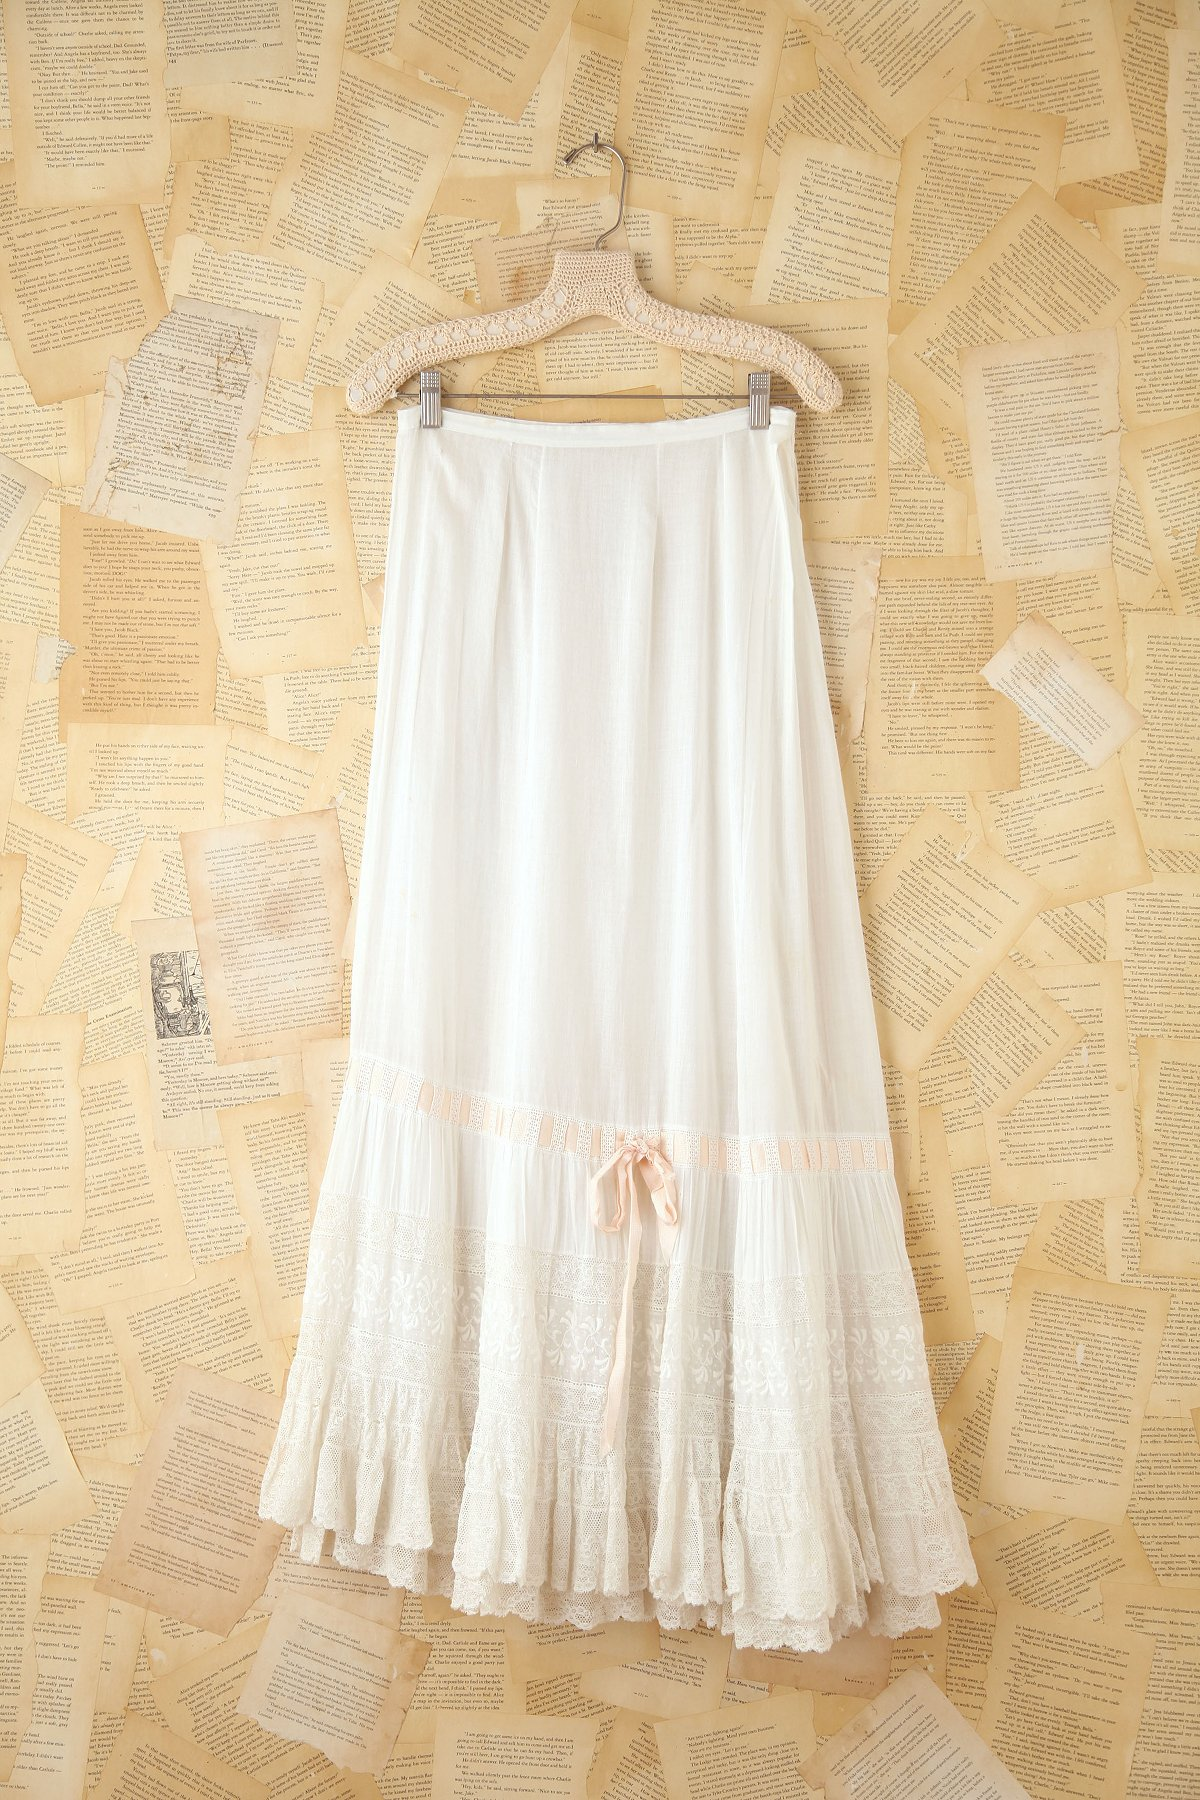 Vintage Long Lace Skirt